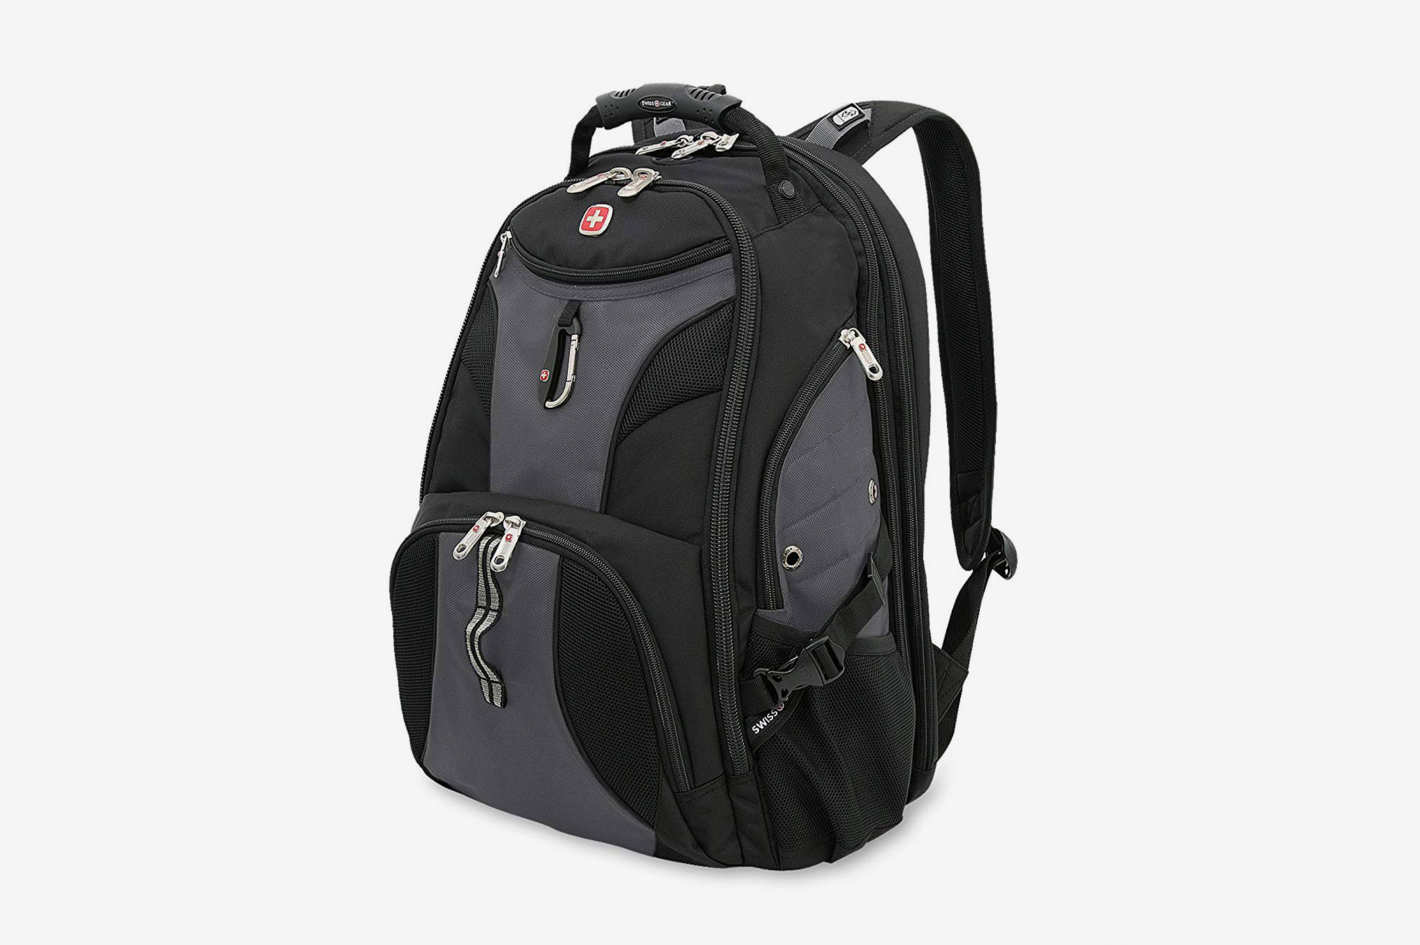 Backpack clipart back pack.  best backpacks for